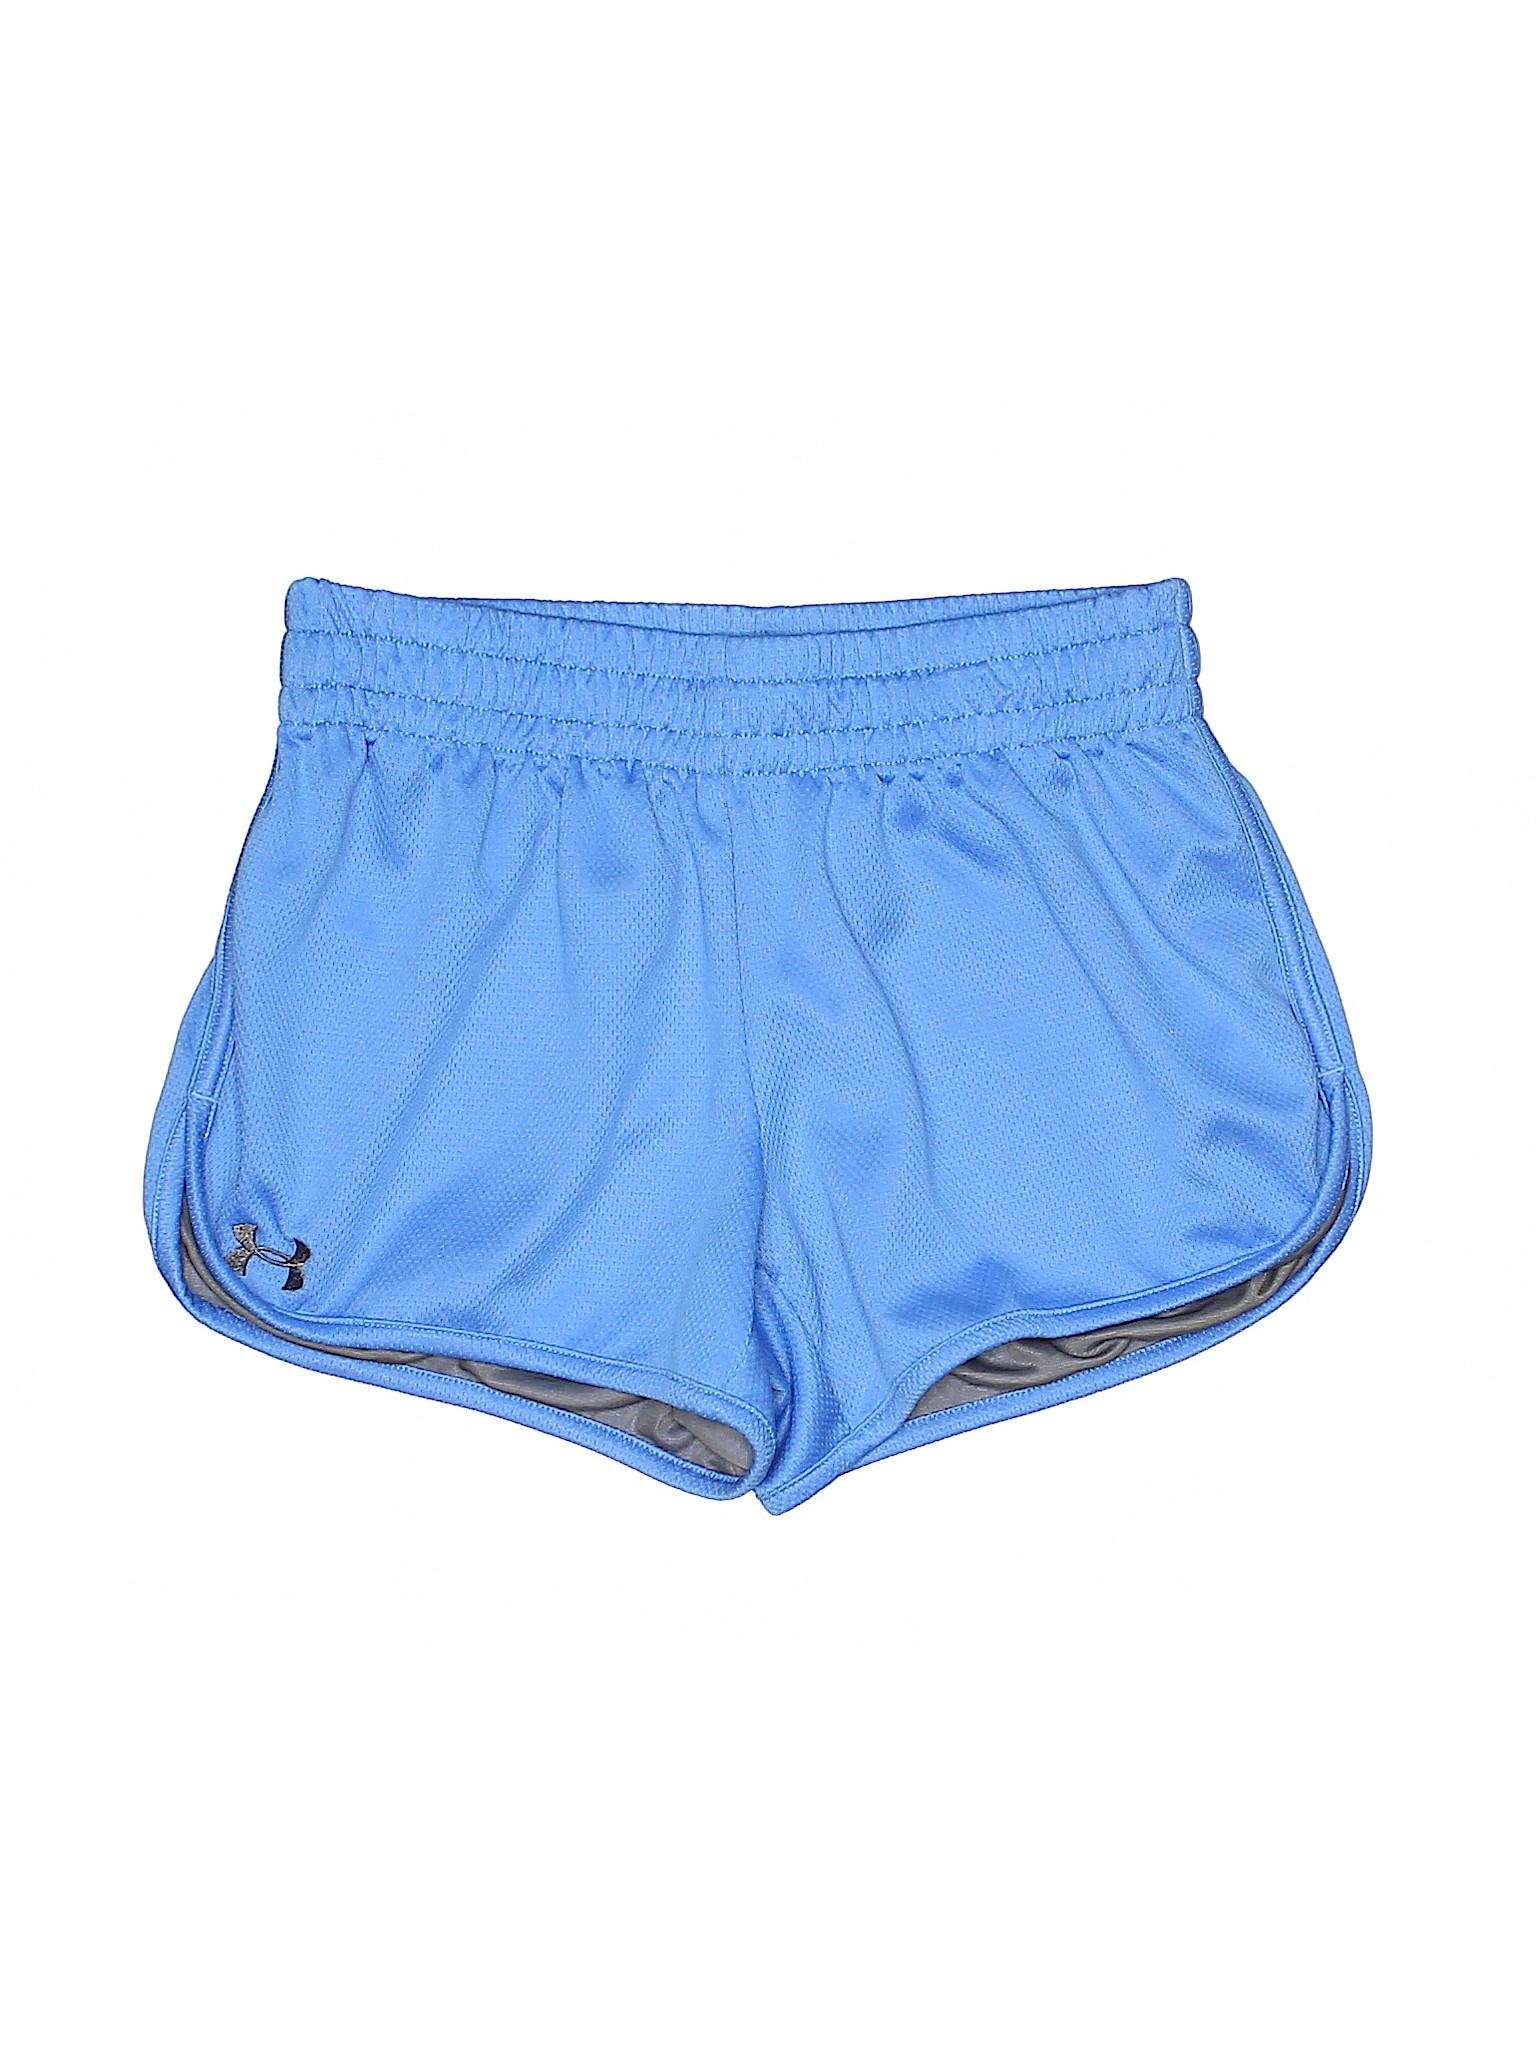 Under Athletic leisure Shorts Armour Boutique 8Zqwvn0